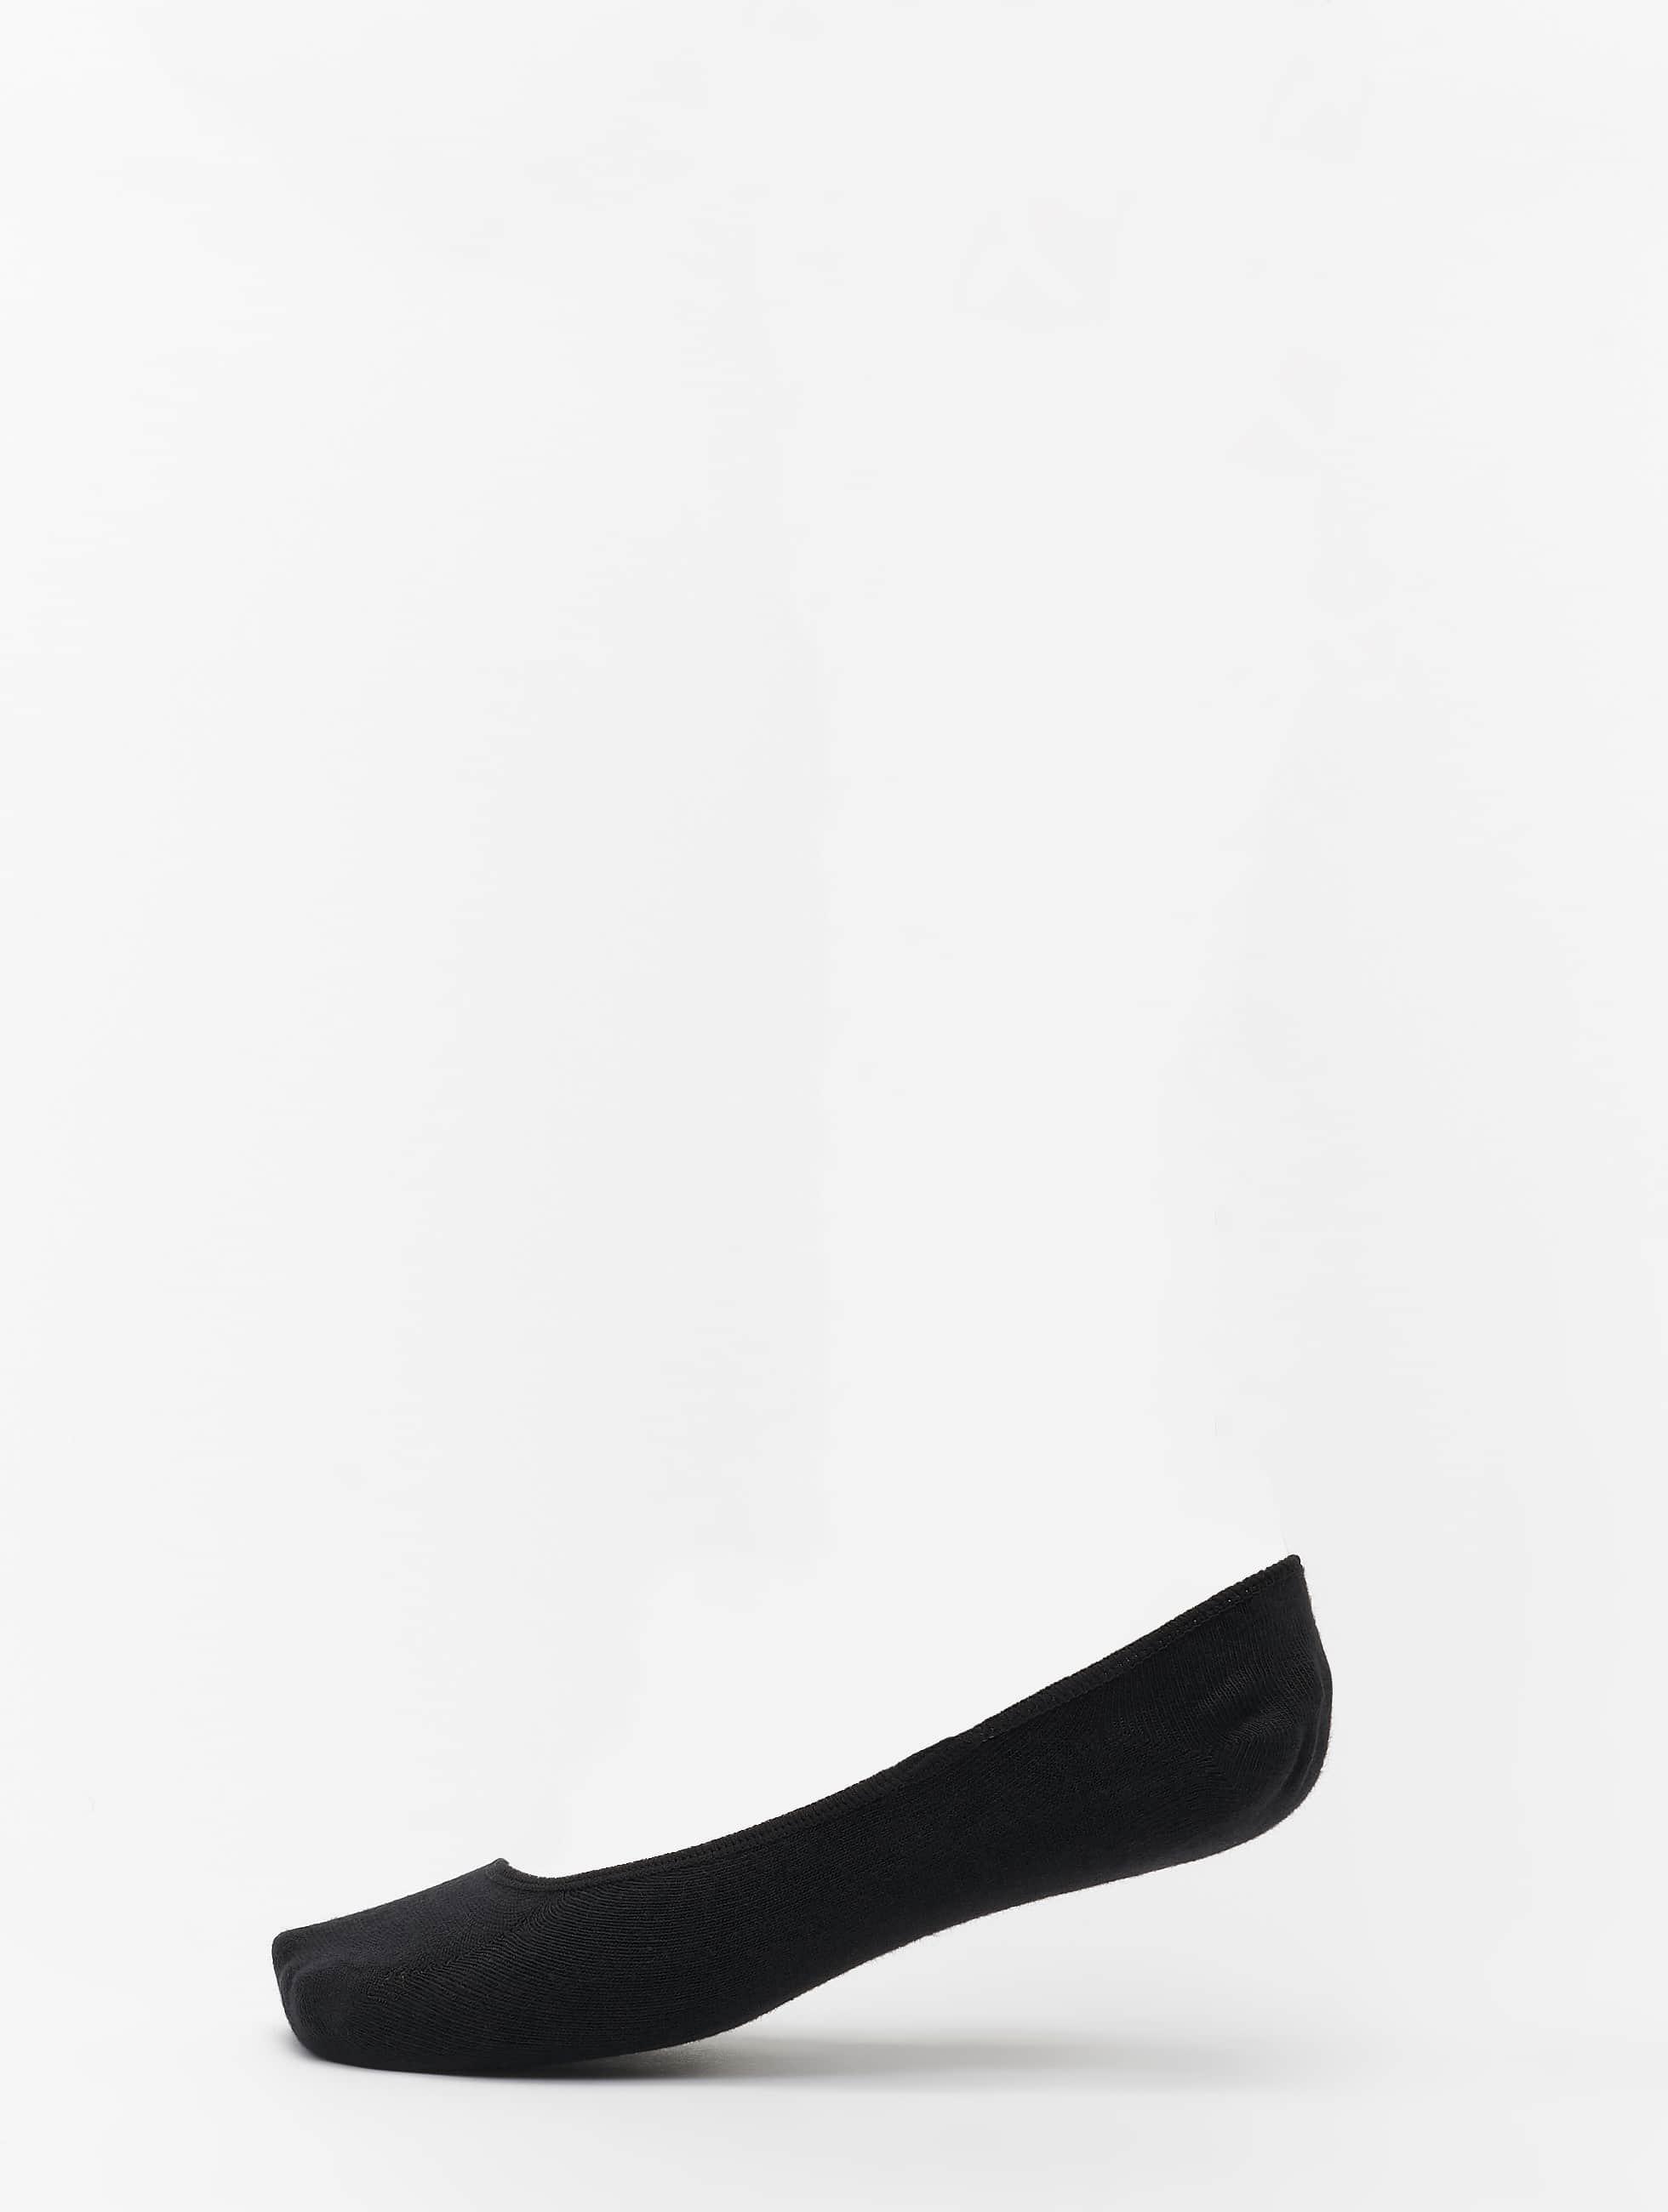 Urban Classics Socks Classics Invisible Socks black